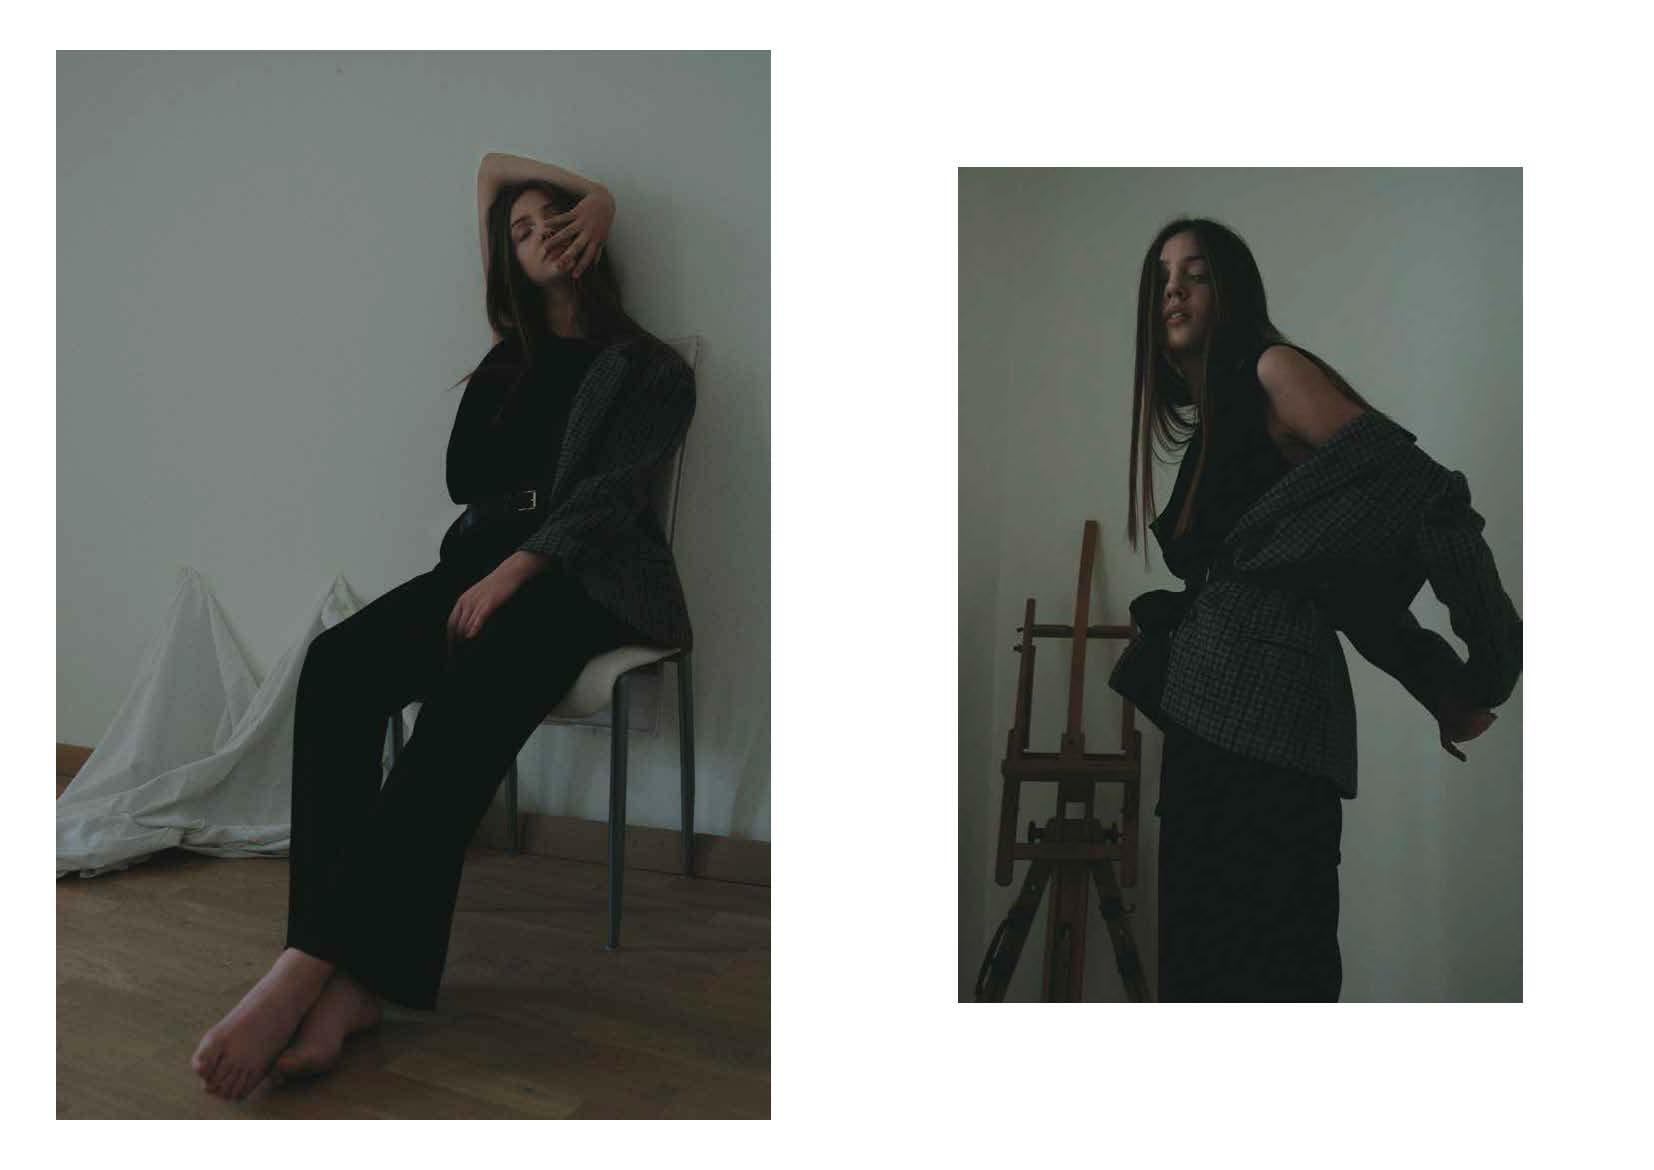 blazer STYLIST ARCHIVE, black top ANN DEMEULEMEESTER, black trousers LUCIO VANOTTI, belts STYLIST ARCHIVE